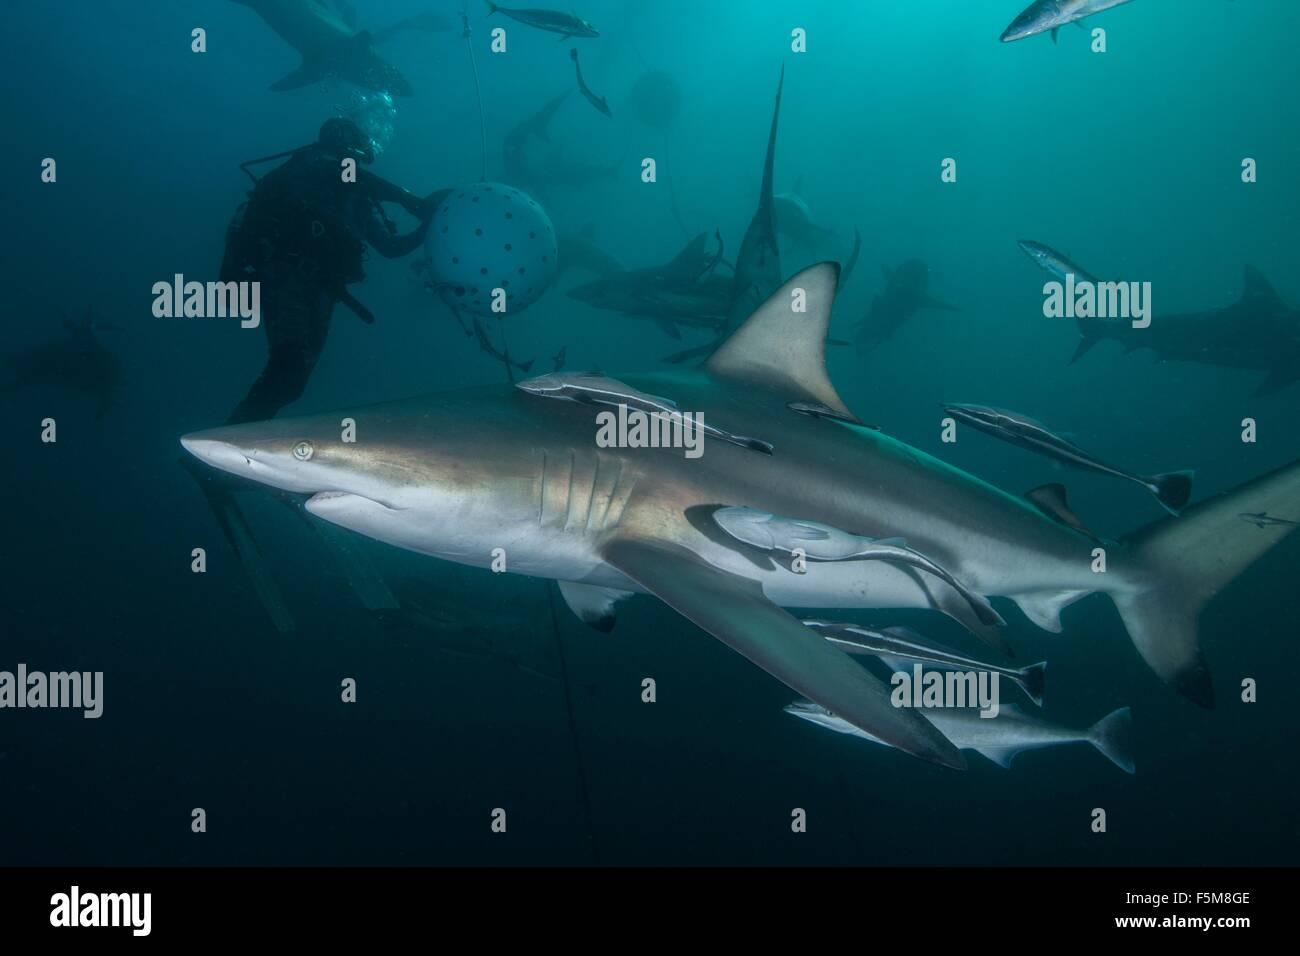 Diver and Oceanic Blacktip sharks (carcharhinus limbatus) gathering at Aliwal Shoal, Durban, South Africa - Stock Image